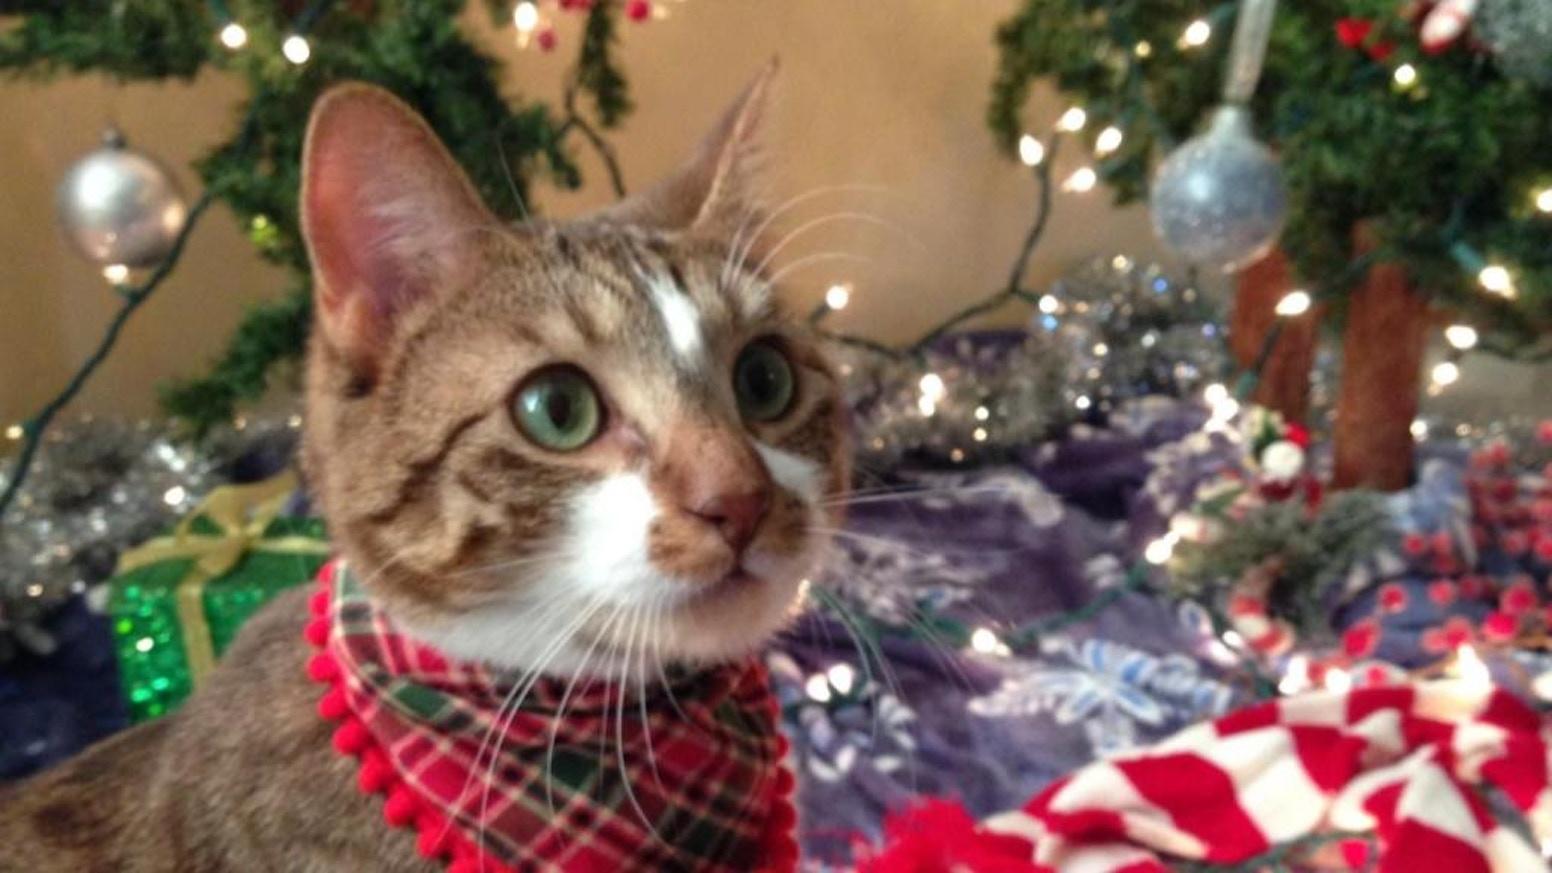 Kitten Christmas.Christmas Kitten Album Free Demo Song By Marquesa The